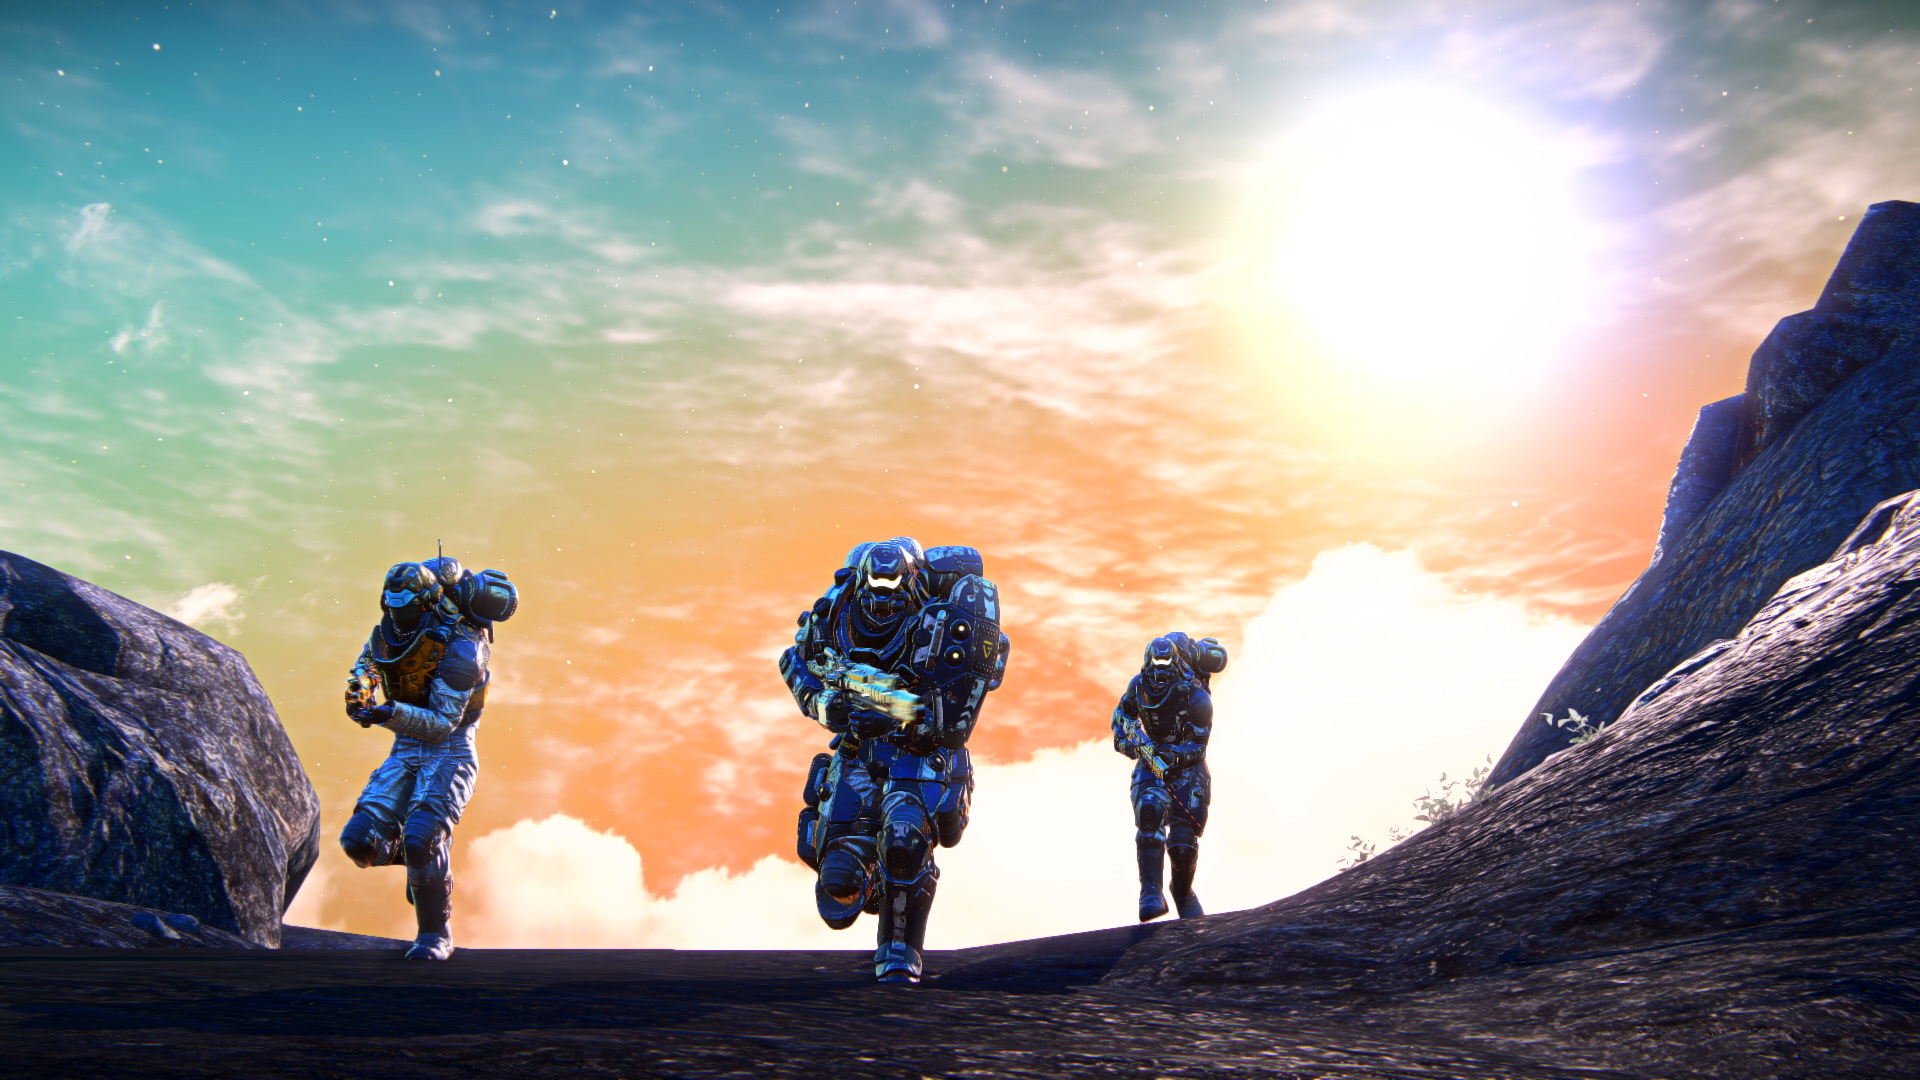 Daybreak_PlanetSide Arena_Action_4